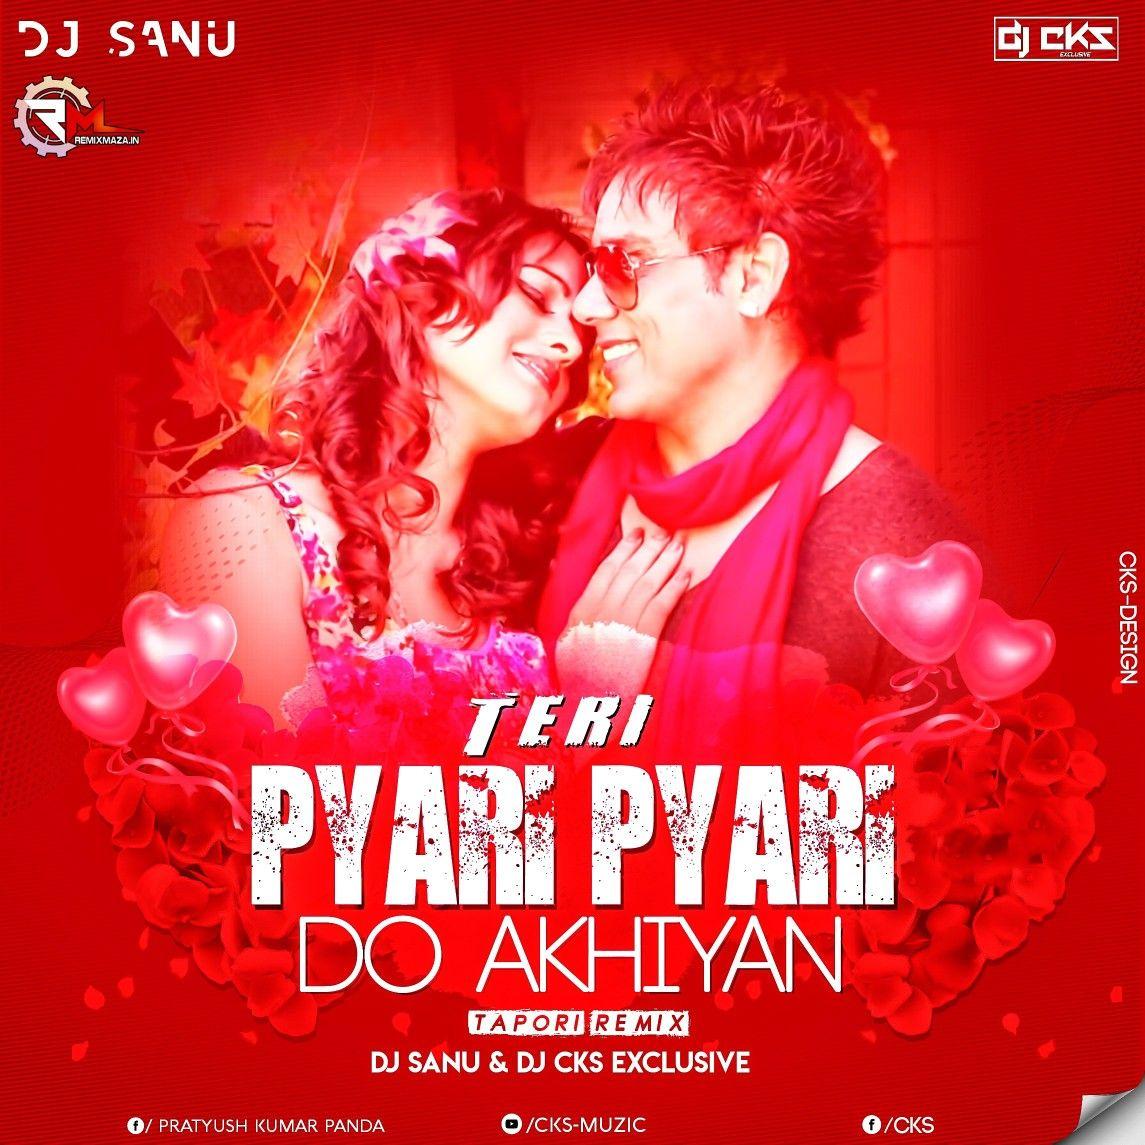 Teri Pyari Pyari Do Akhiyan Tapori Dance Mix Dj Sanu X Dj Cks Download Https Bit Ly 2wmvsdh Follow Https Www Instagram Com With Images Mixing Dj Dance Remix